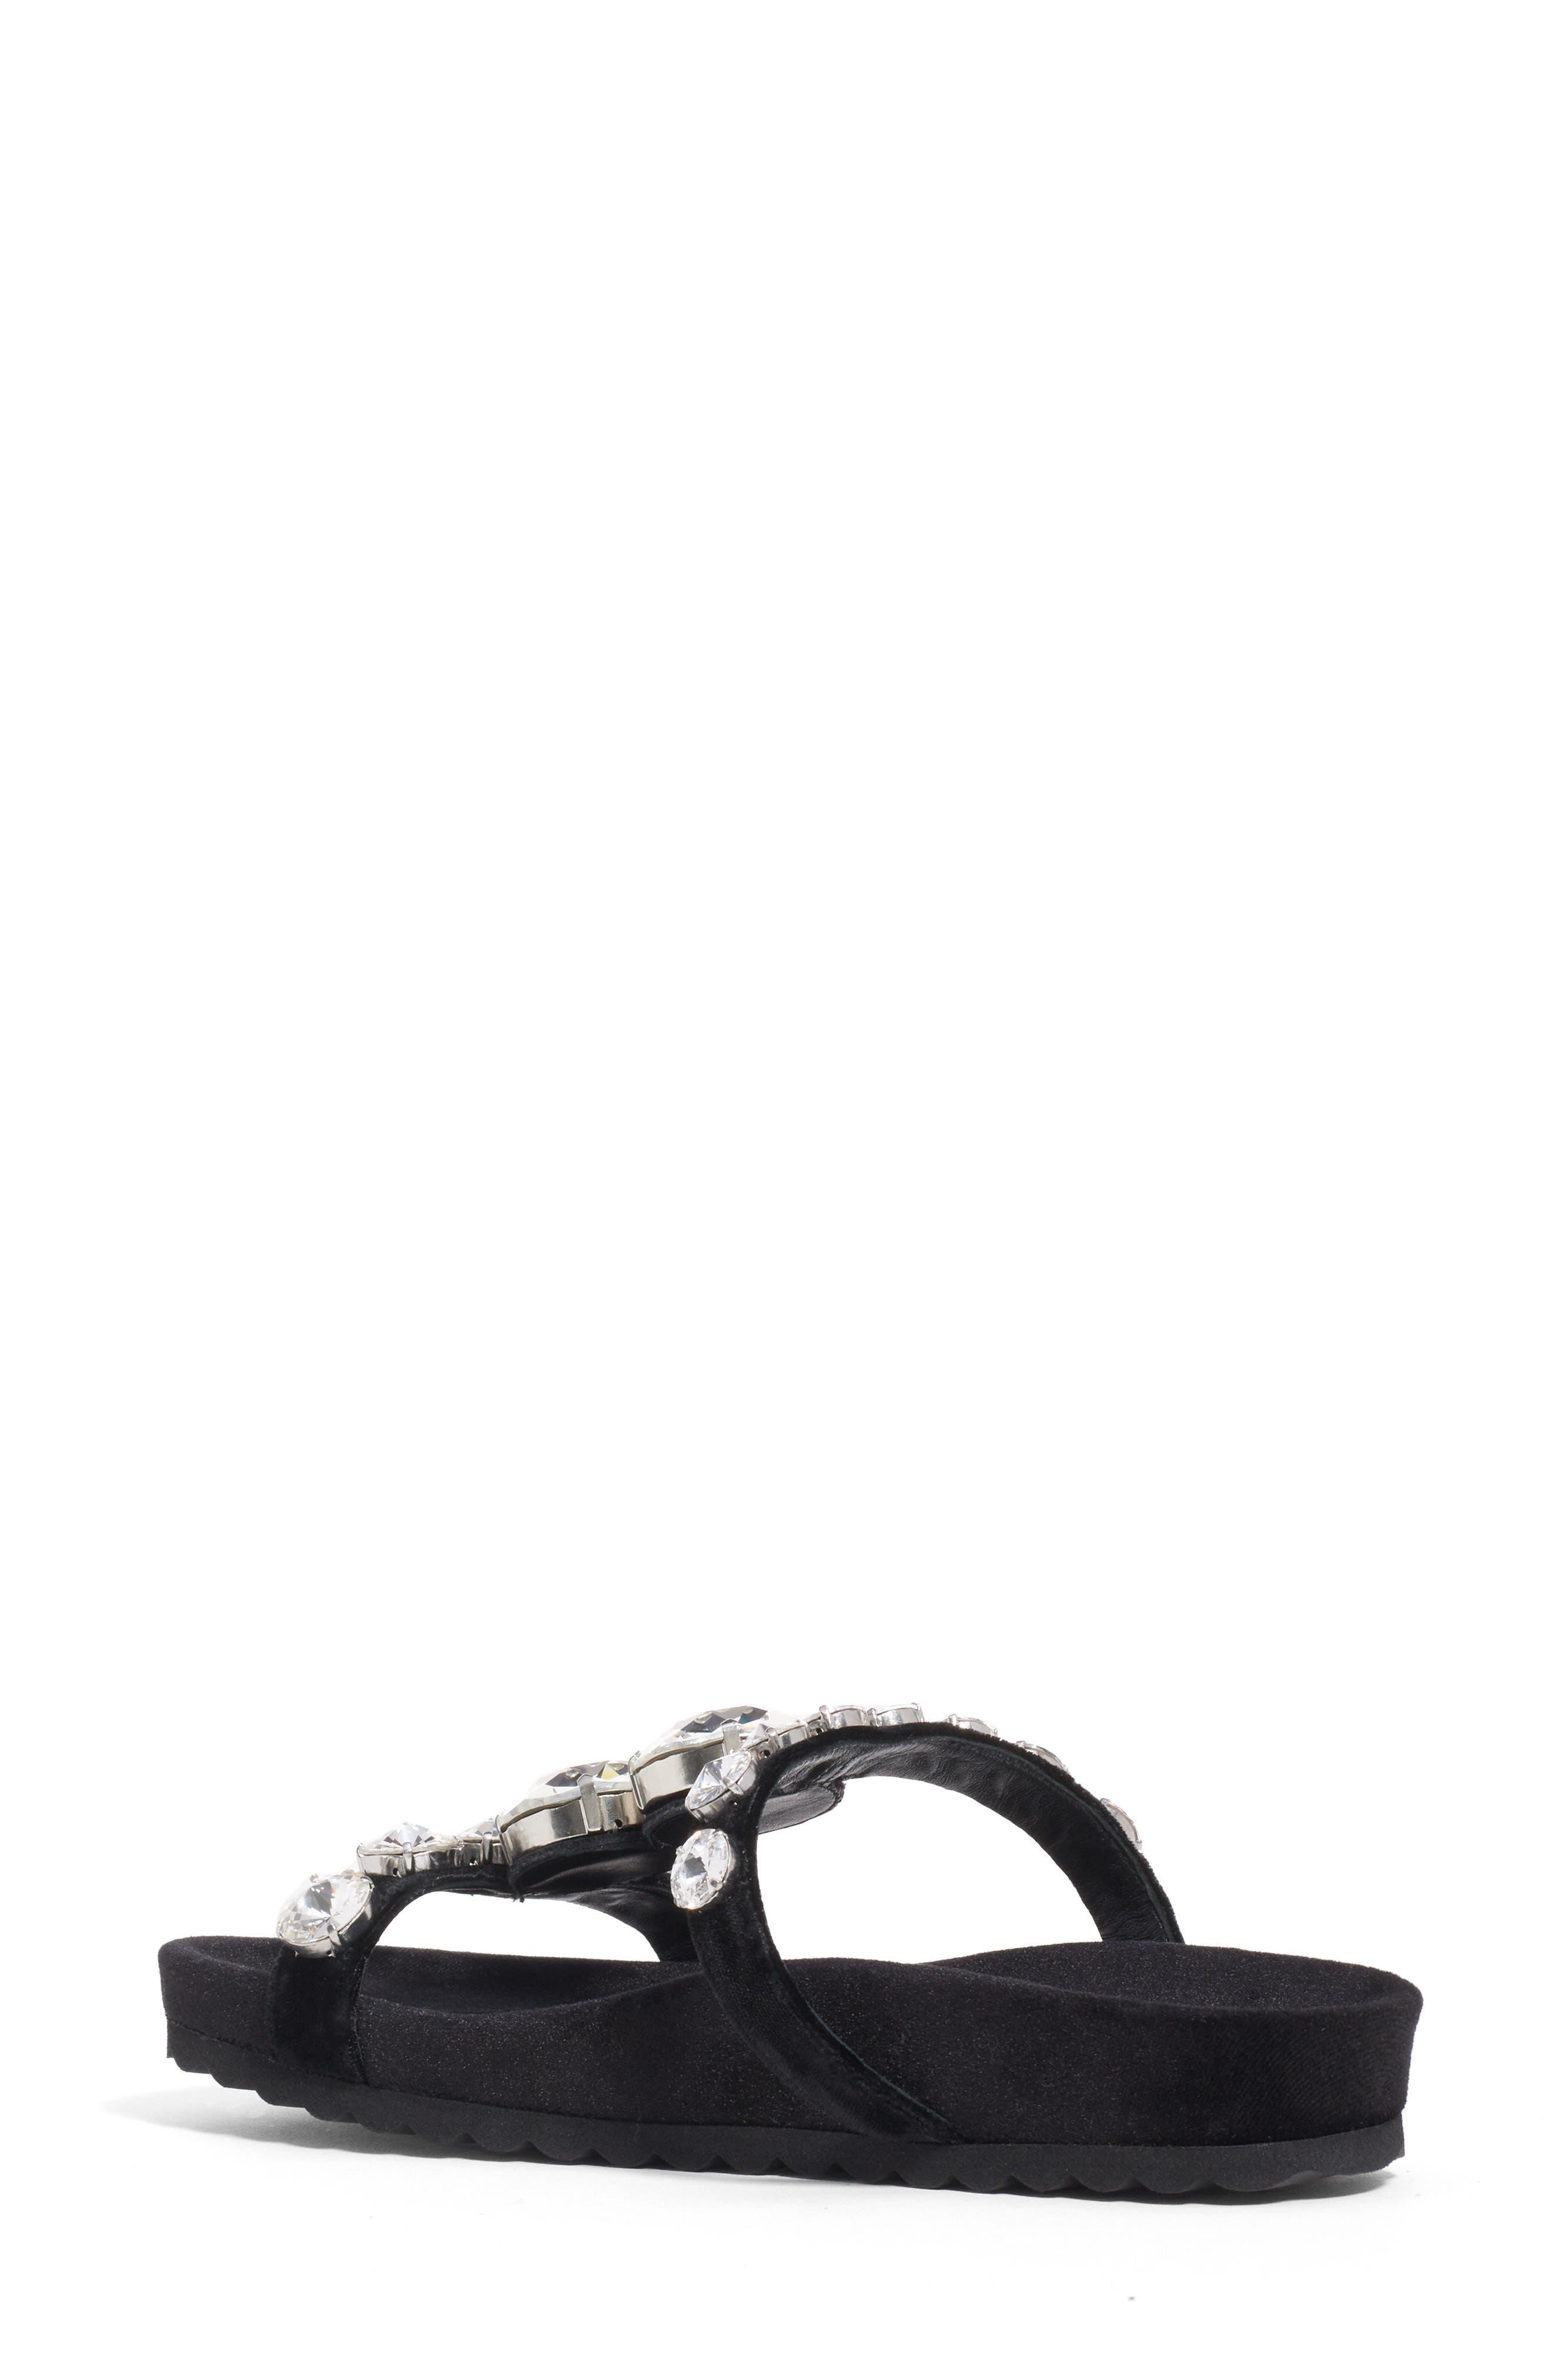 bb1d5f1e219 Women s Designer Shoes